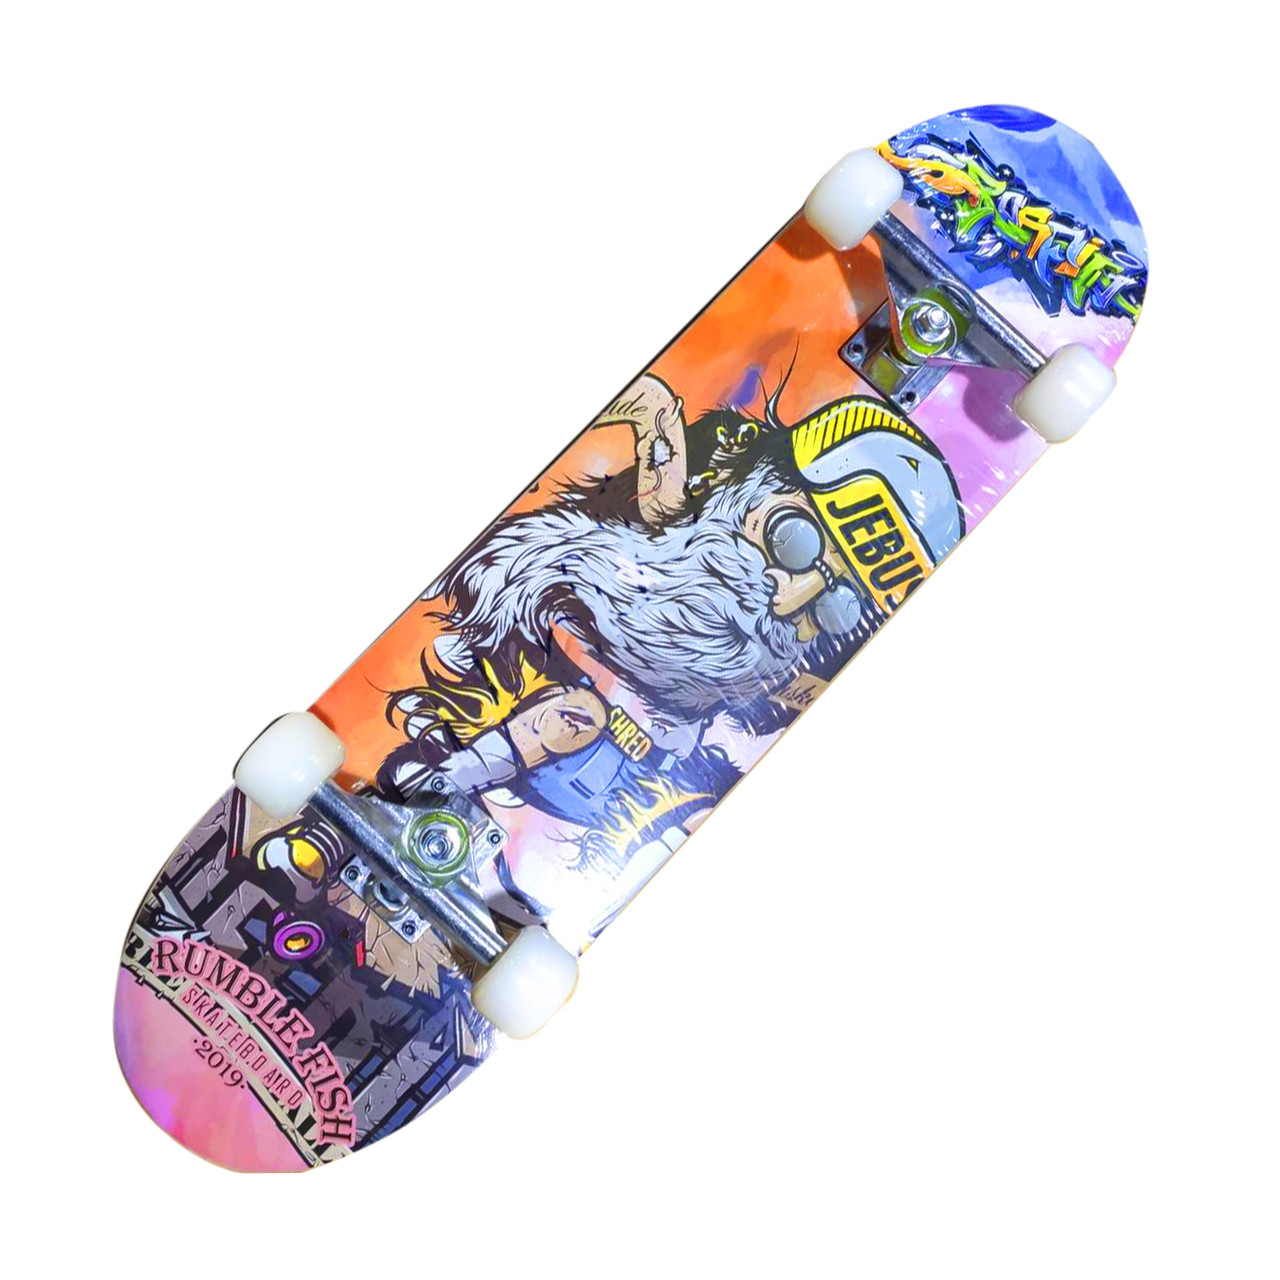 СкейтБорд деревянный ДЕД